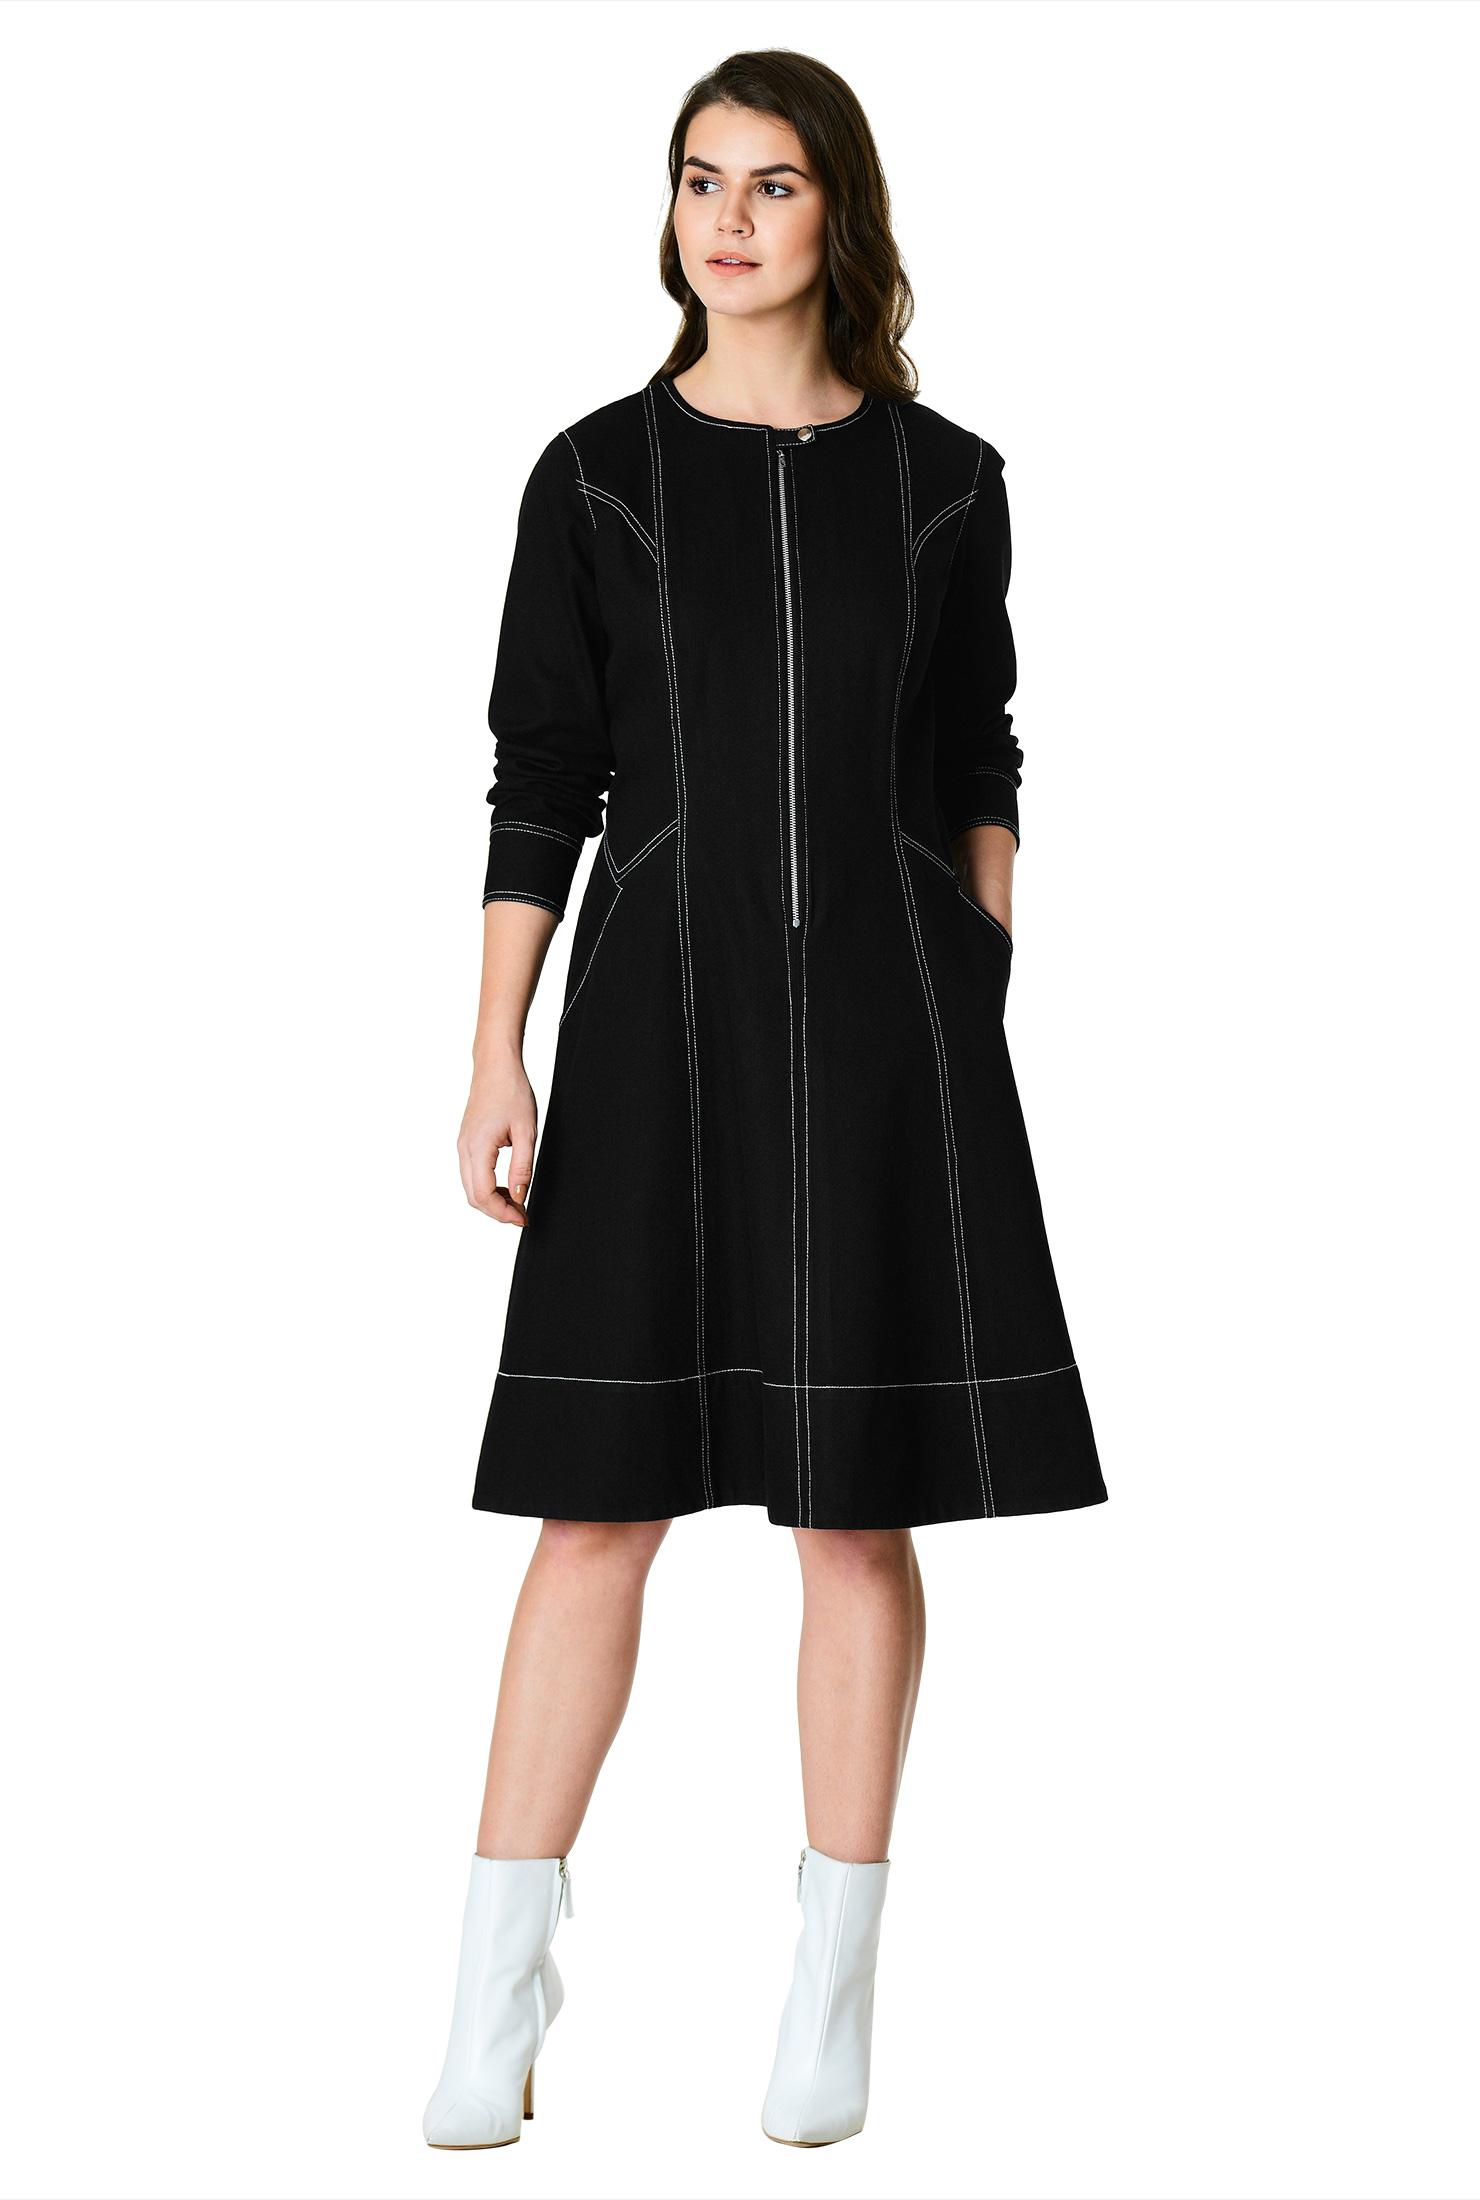 13d2a9b43ad Women s Fashion Clothing 0-36W and Custom